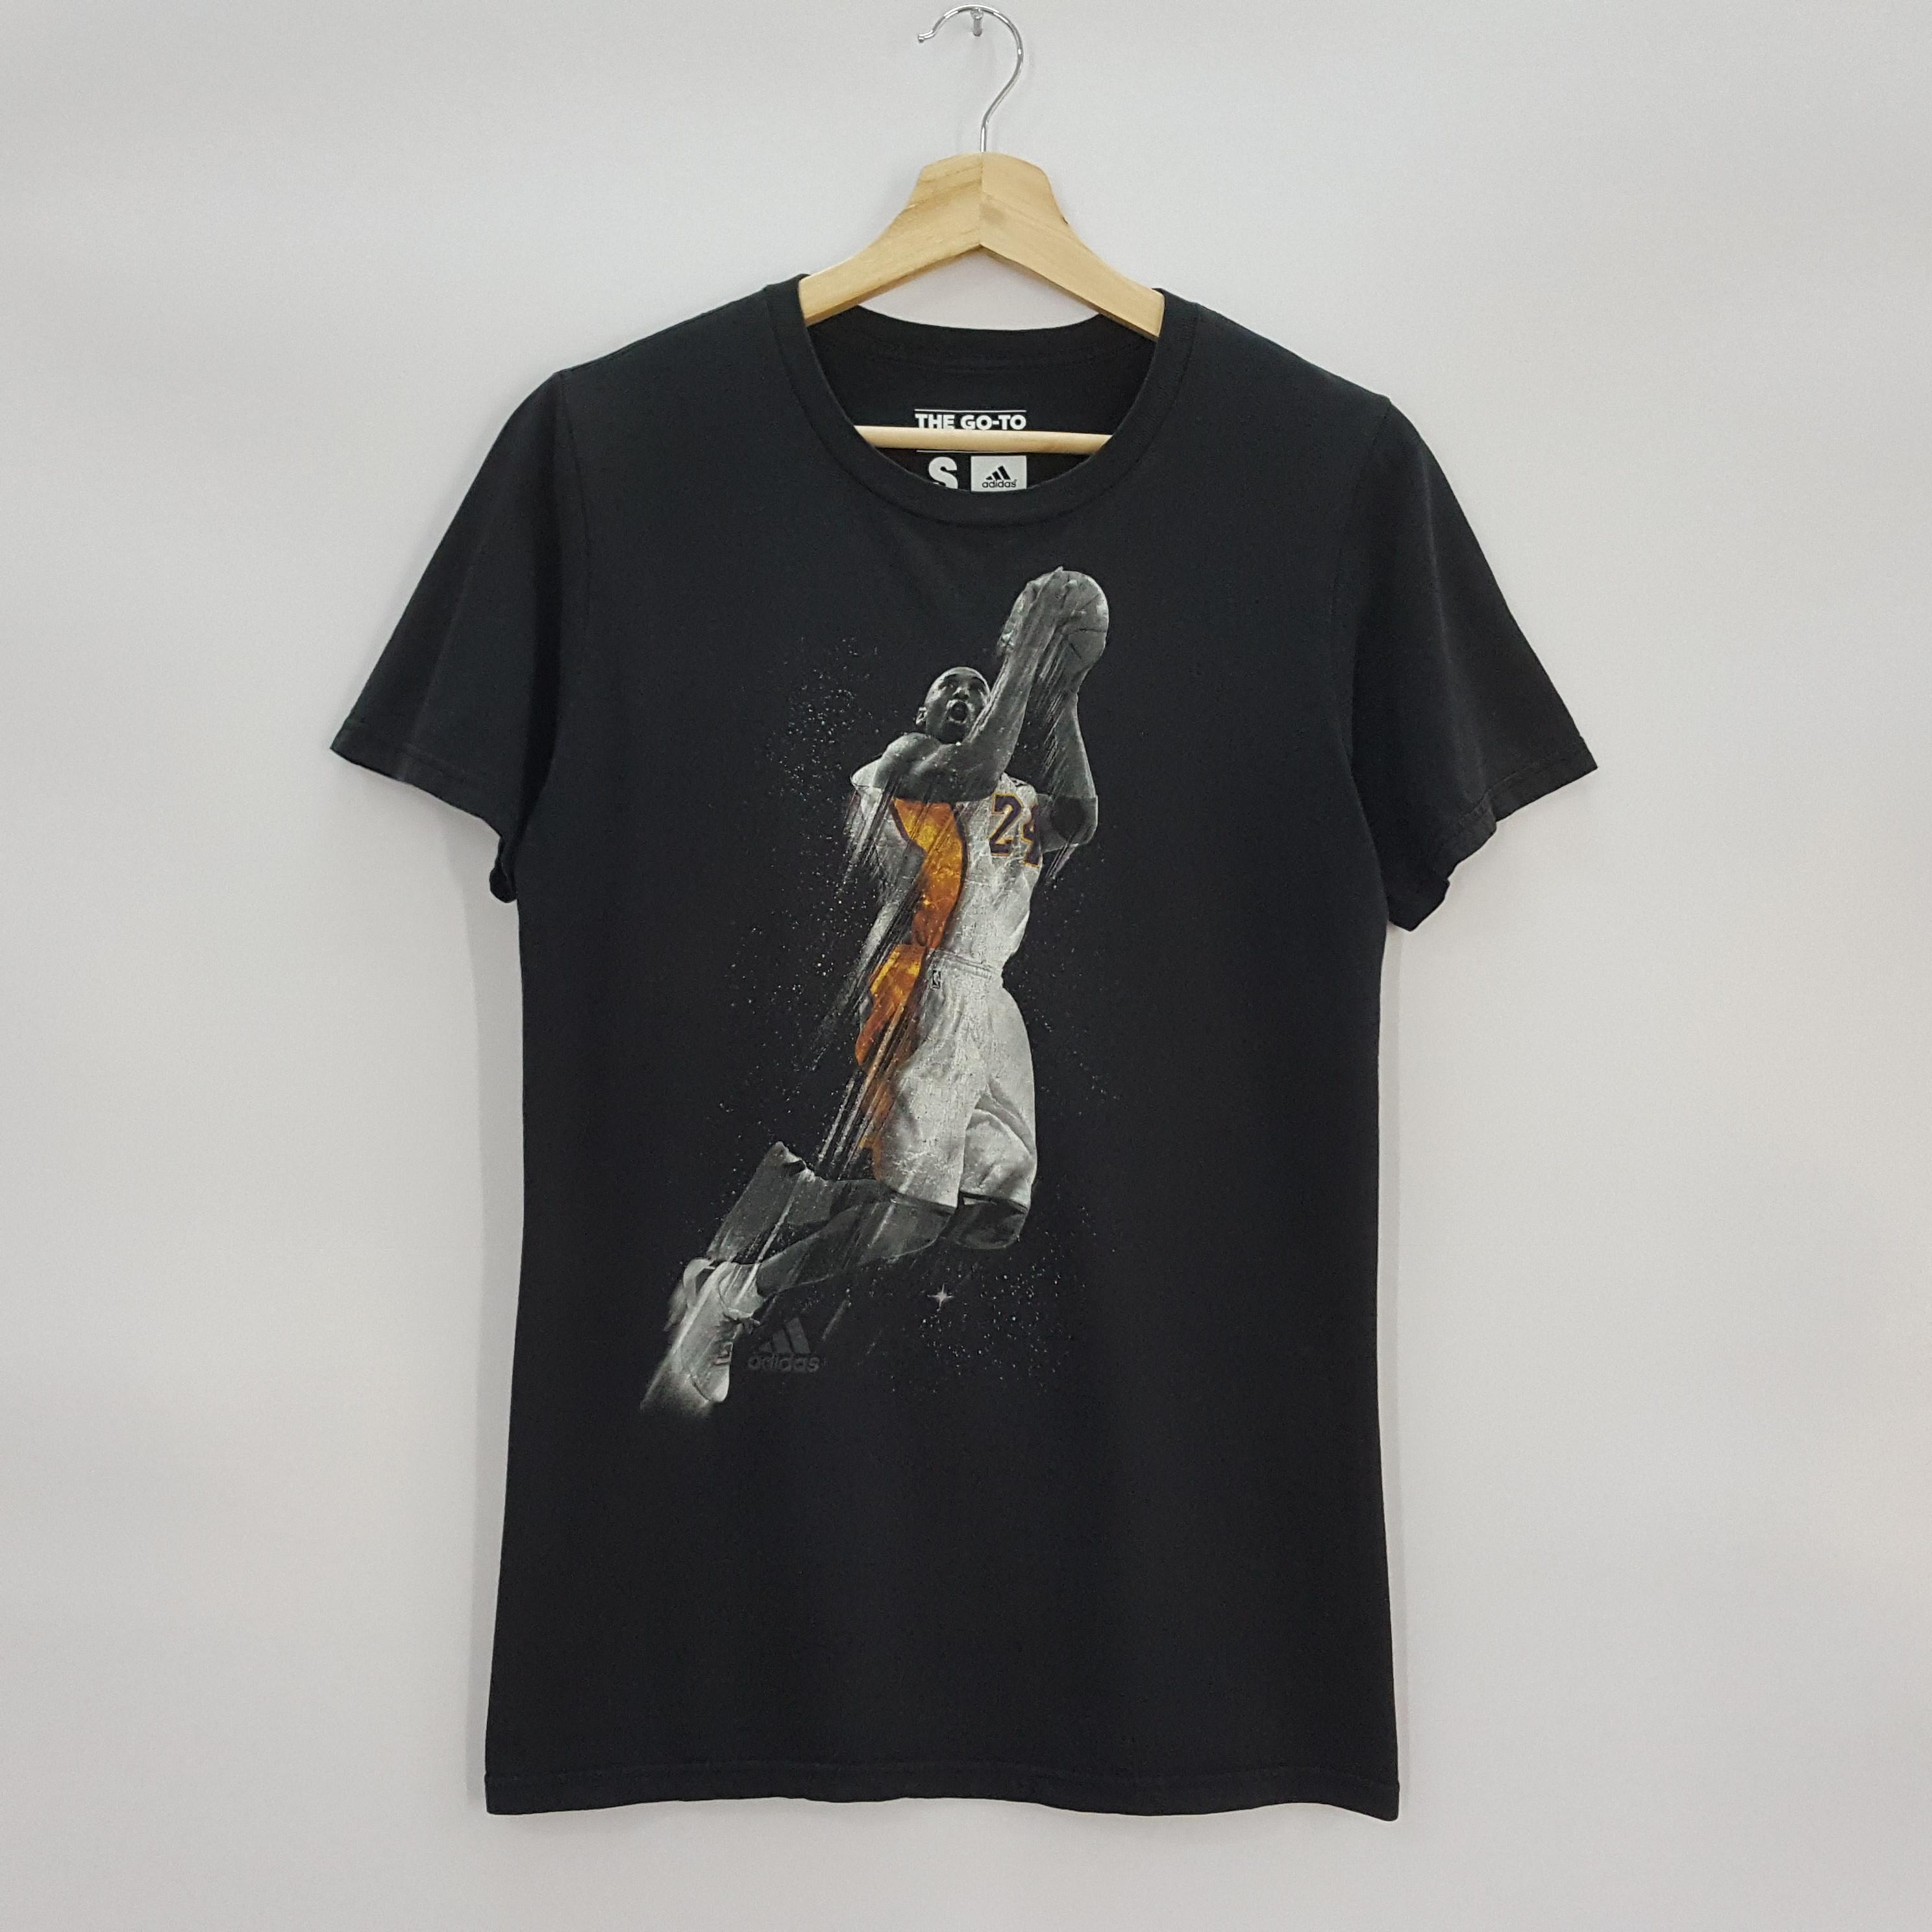 Vintage adidas Kobe Bryant Lakers nice design t shirt